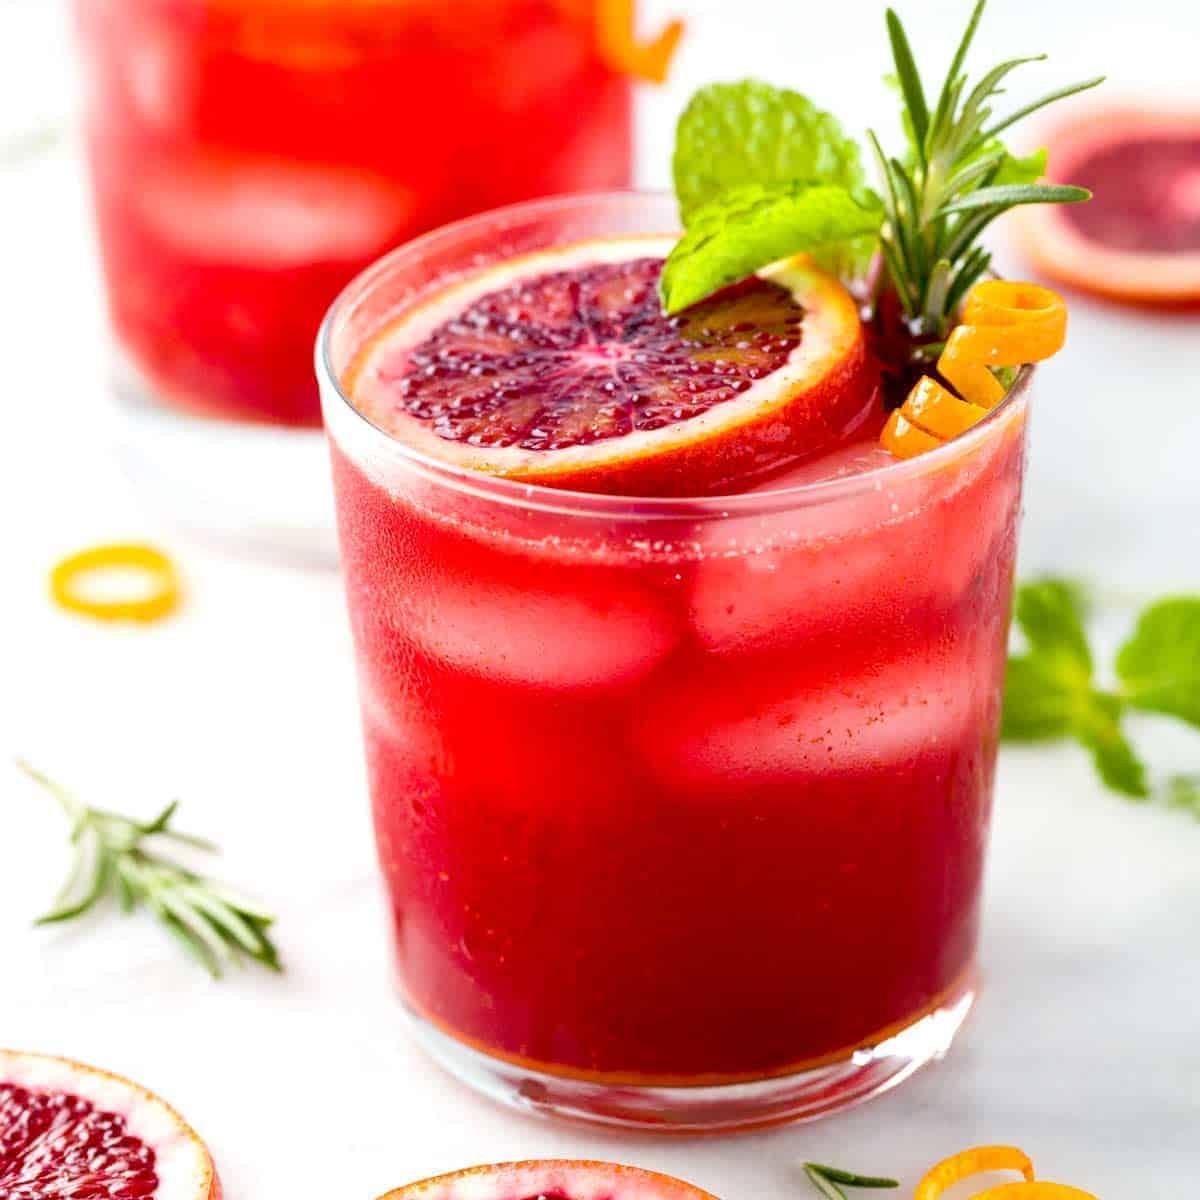 Sparkling Blood Orange Mocktail With Turmeric